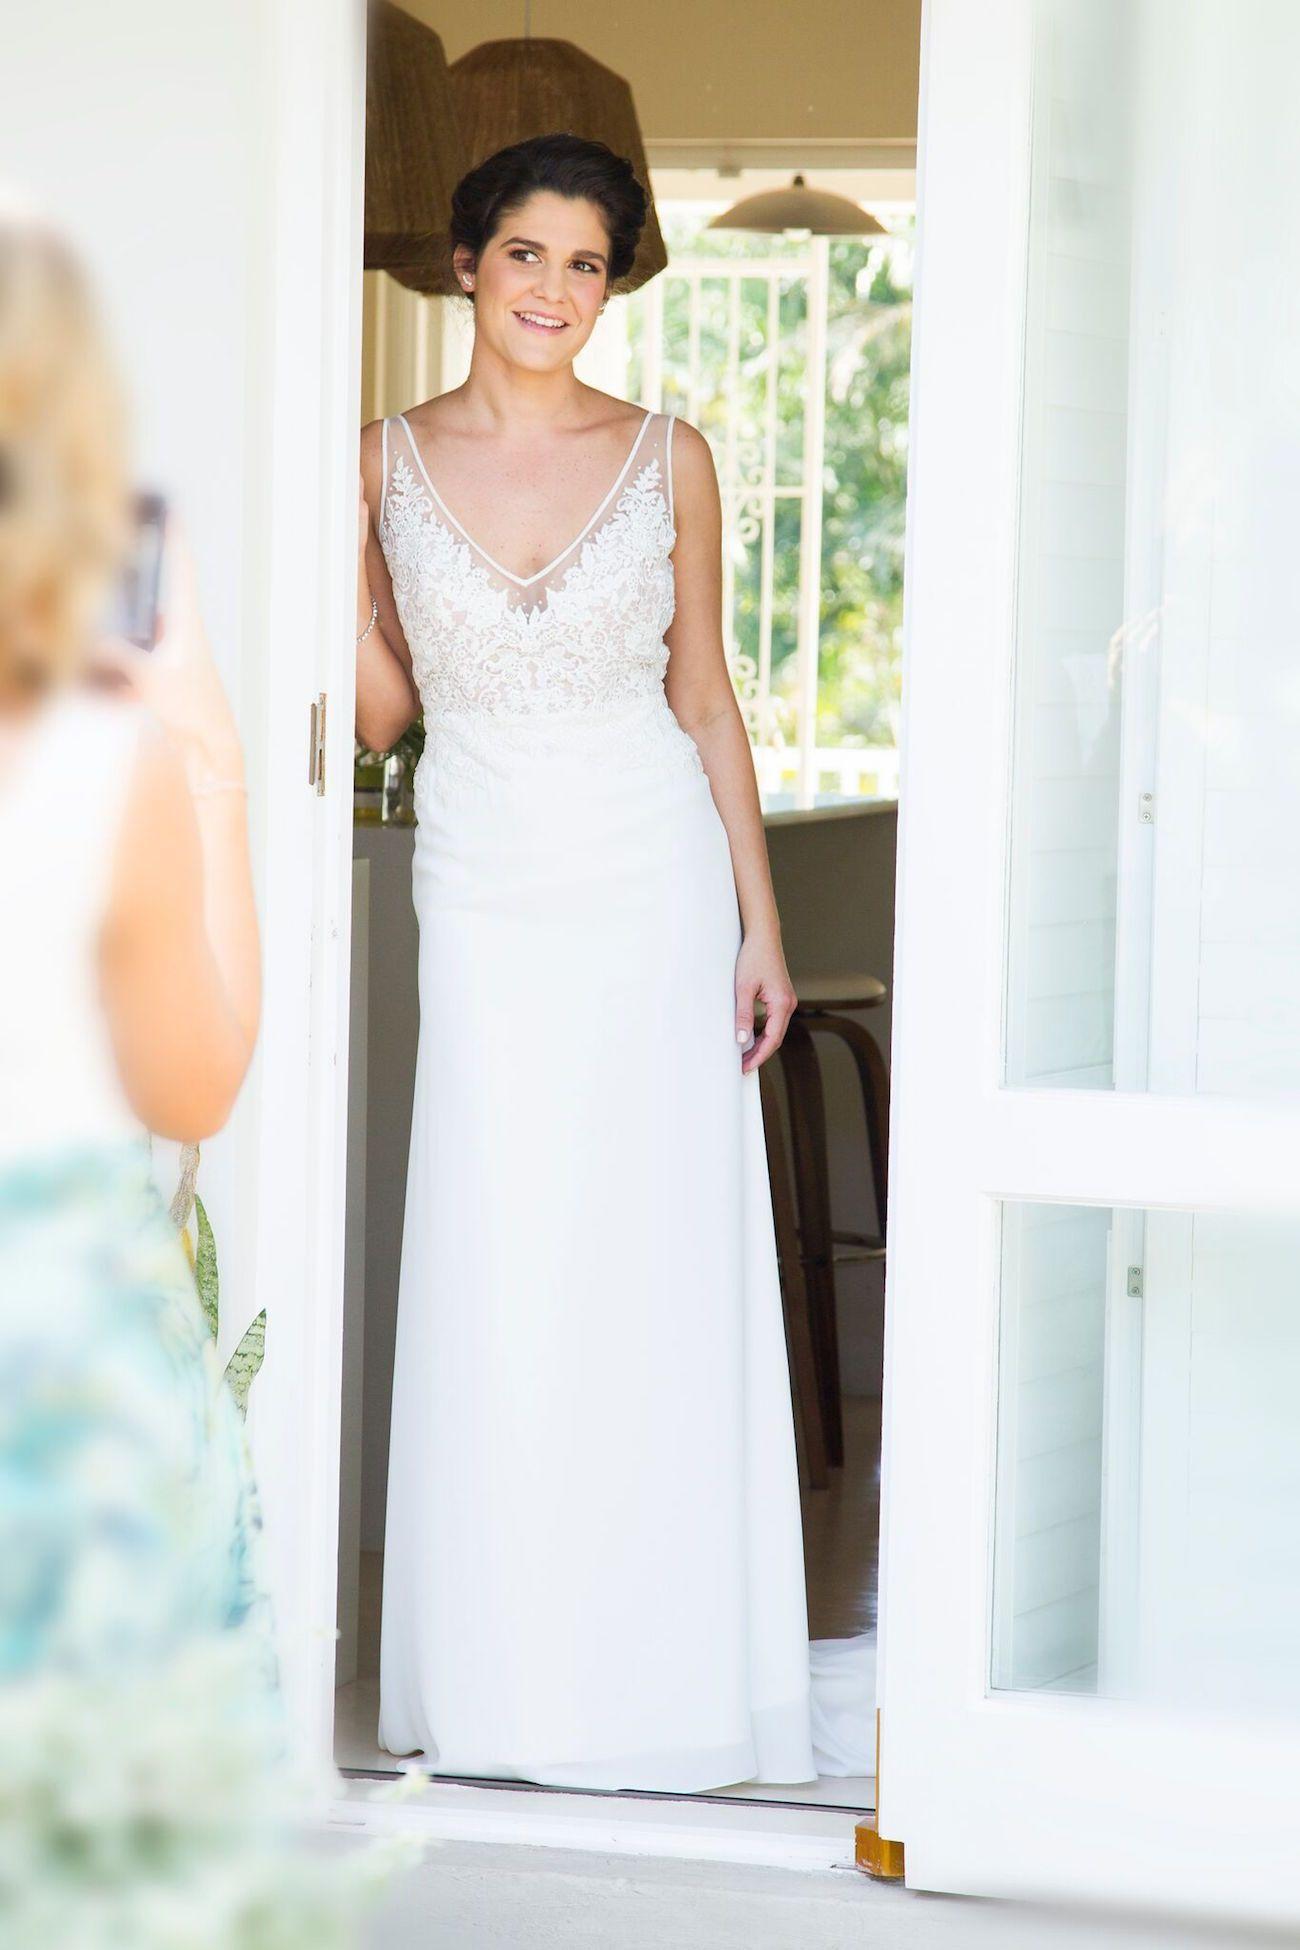 Julia Ferrandi Wedding Dress | Credit: Oh Happy Day/Luke Patterson/Roxanne Davison